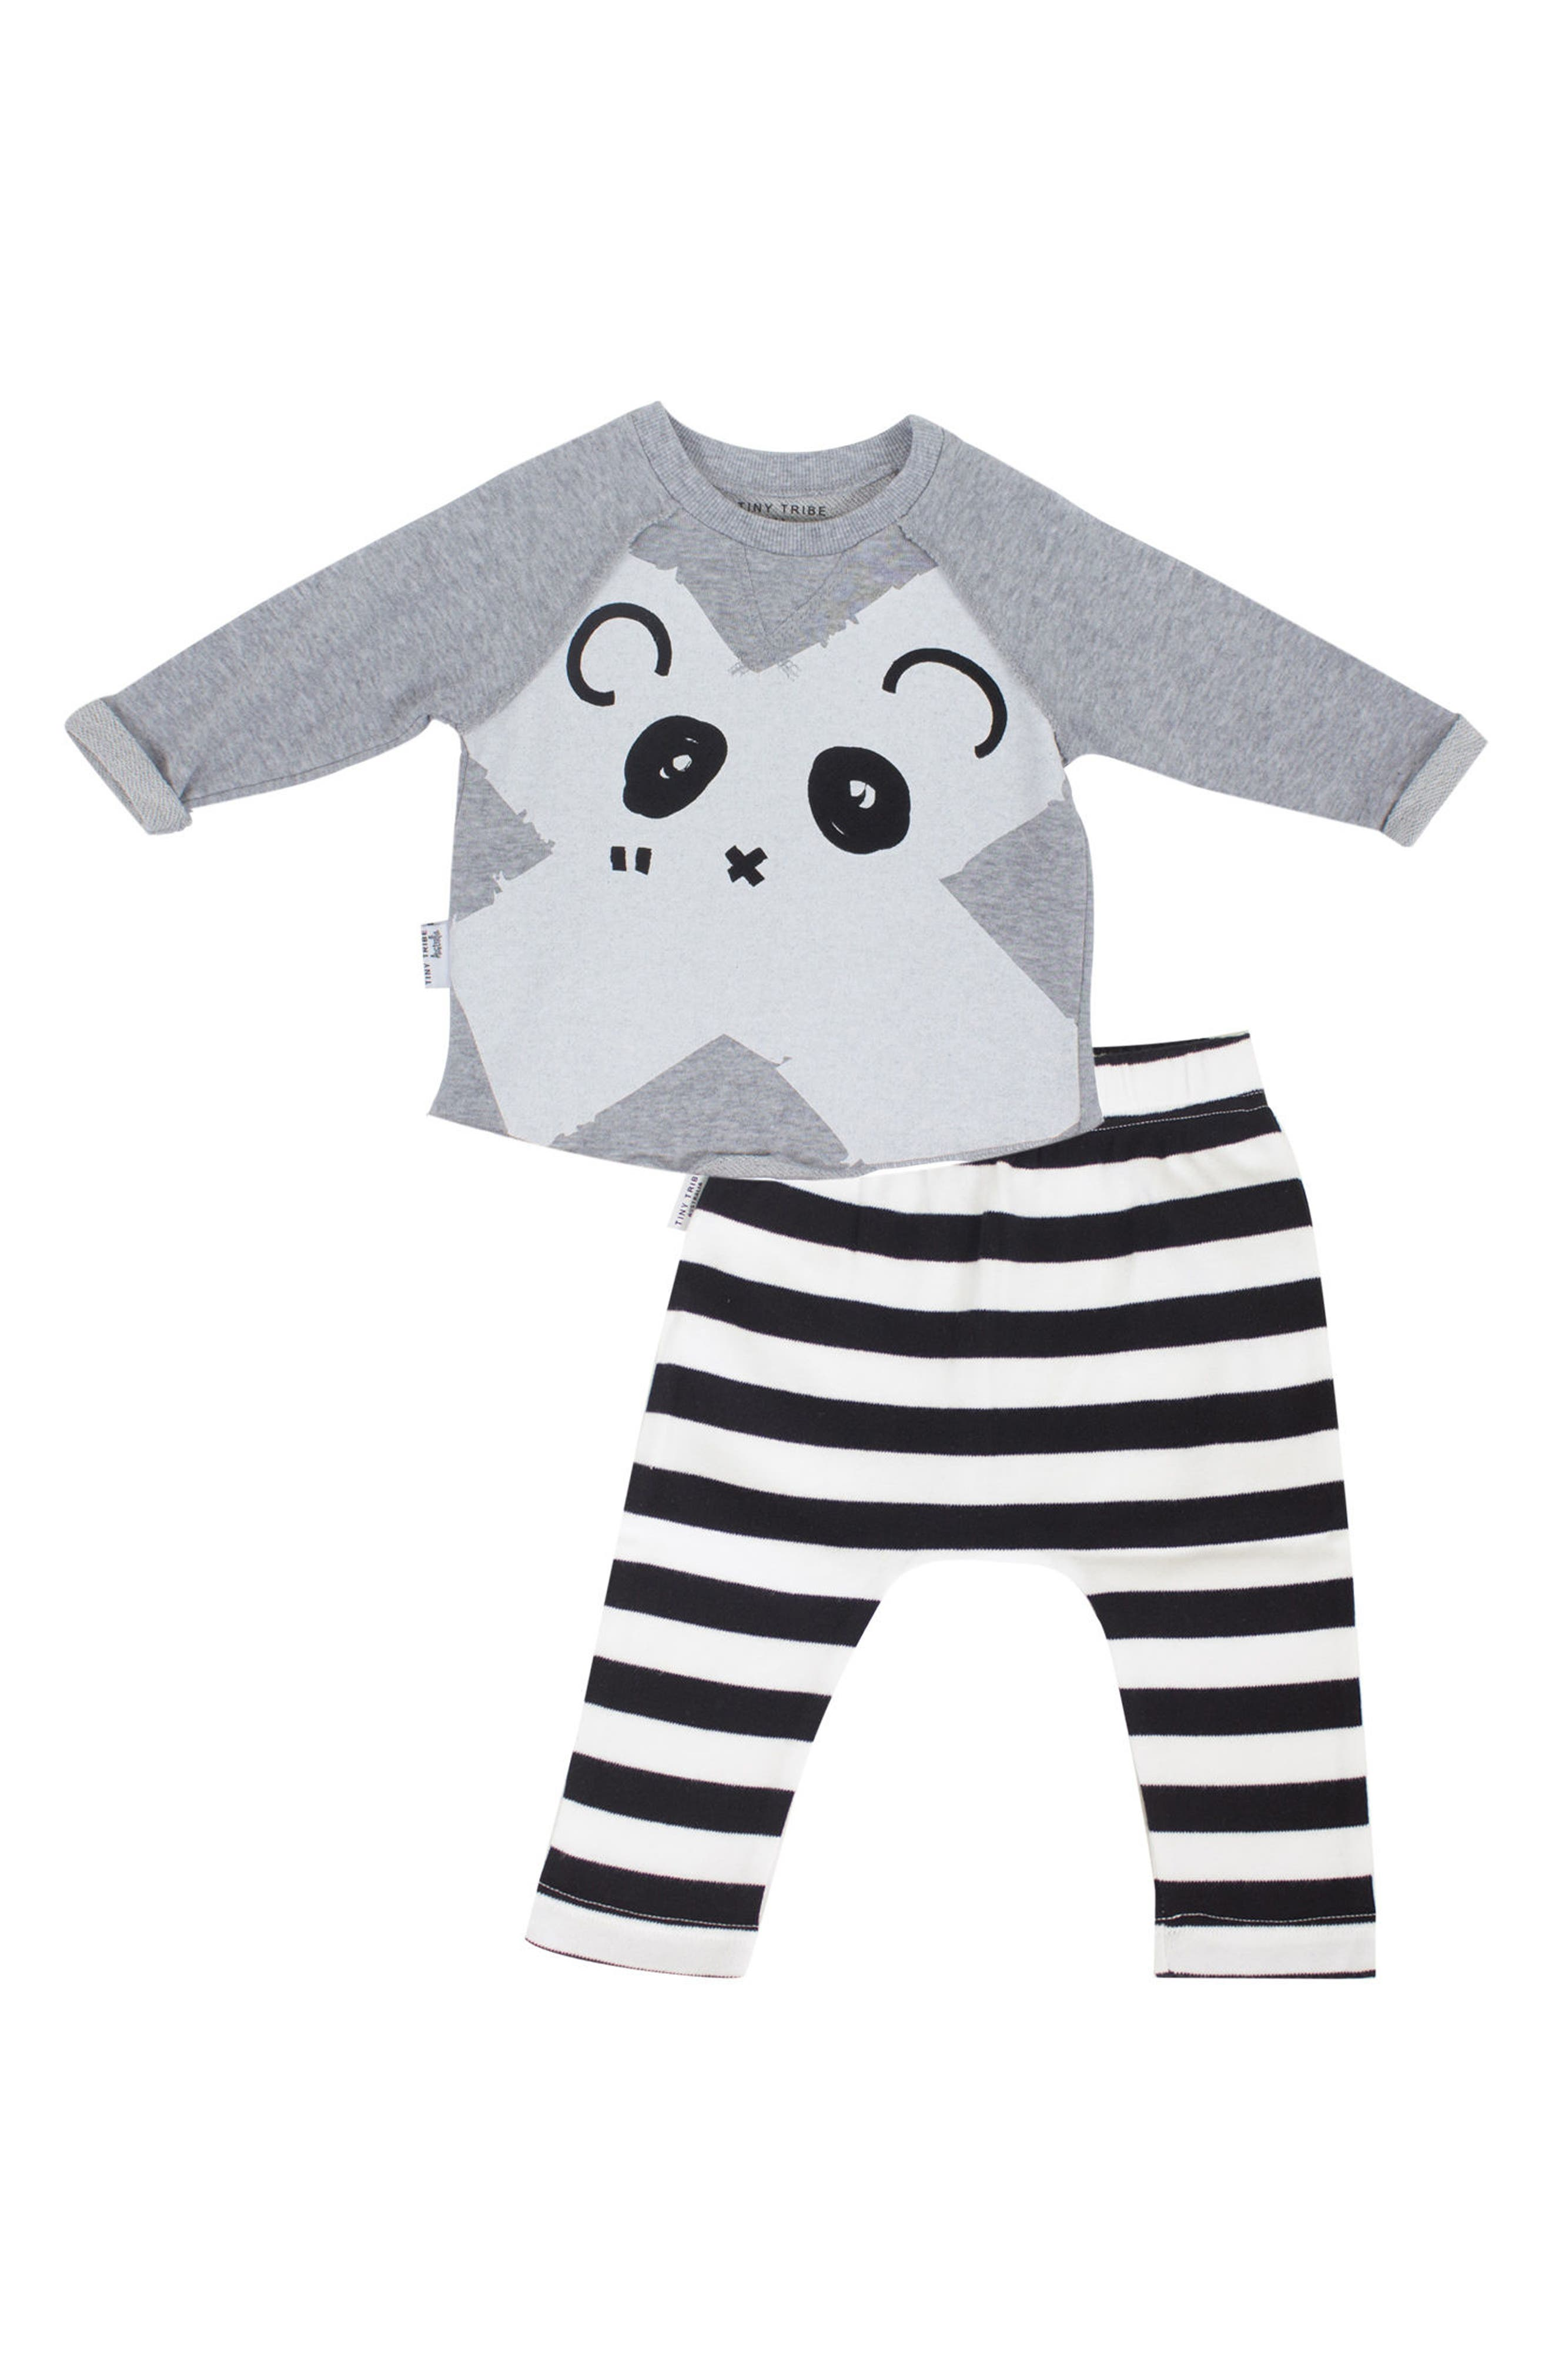 Main Image - Tiny Tribe Panda Sweatshirt & Leggings Set (Baby)